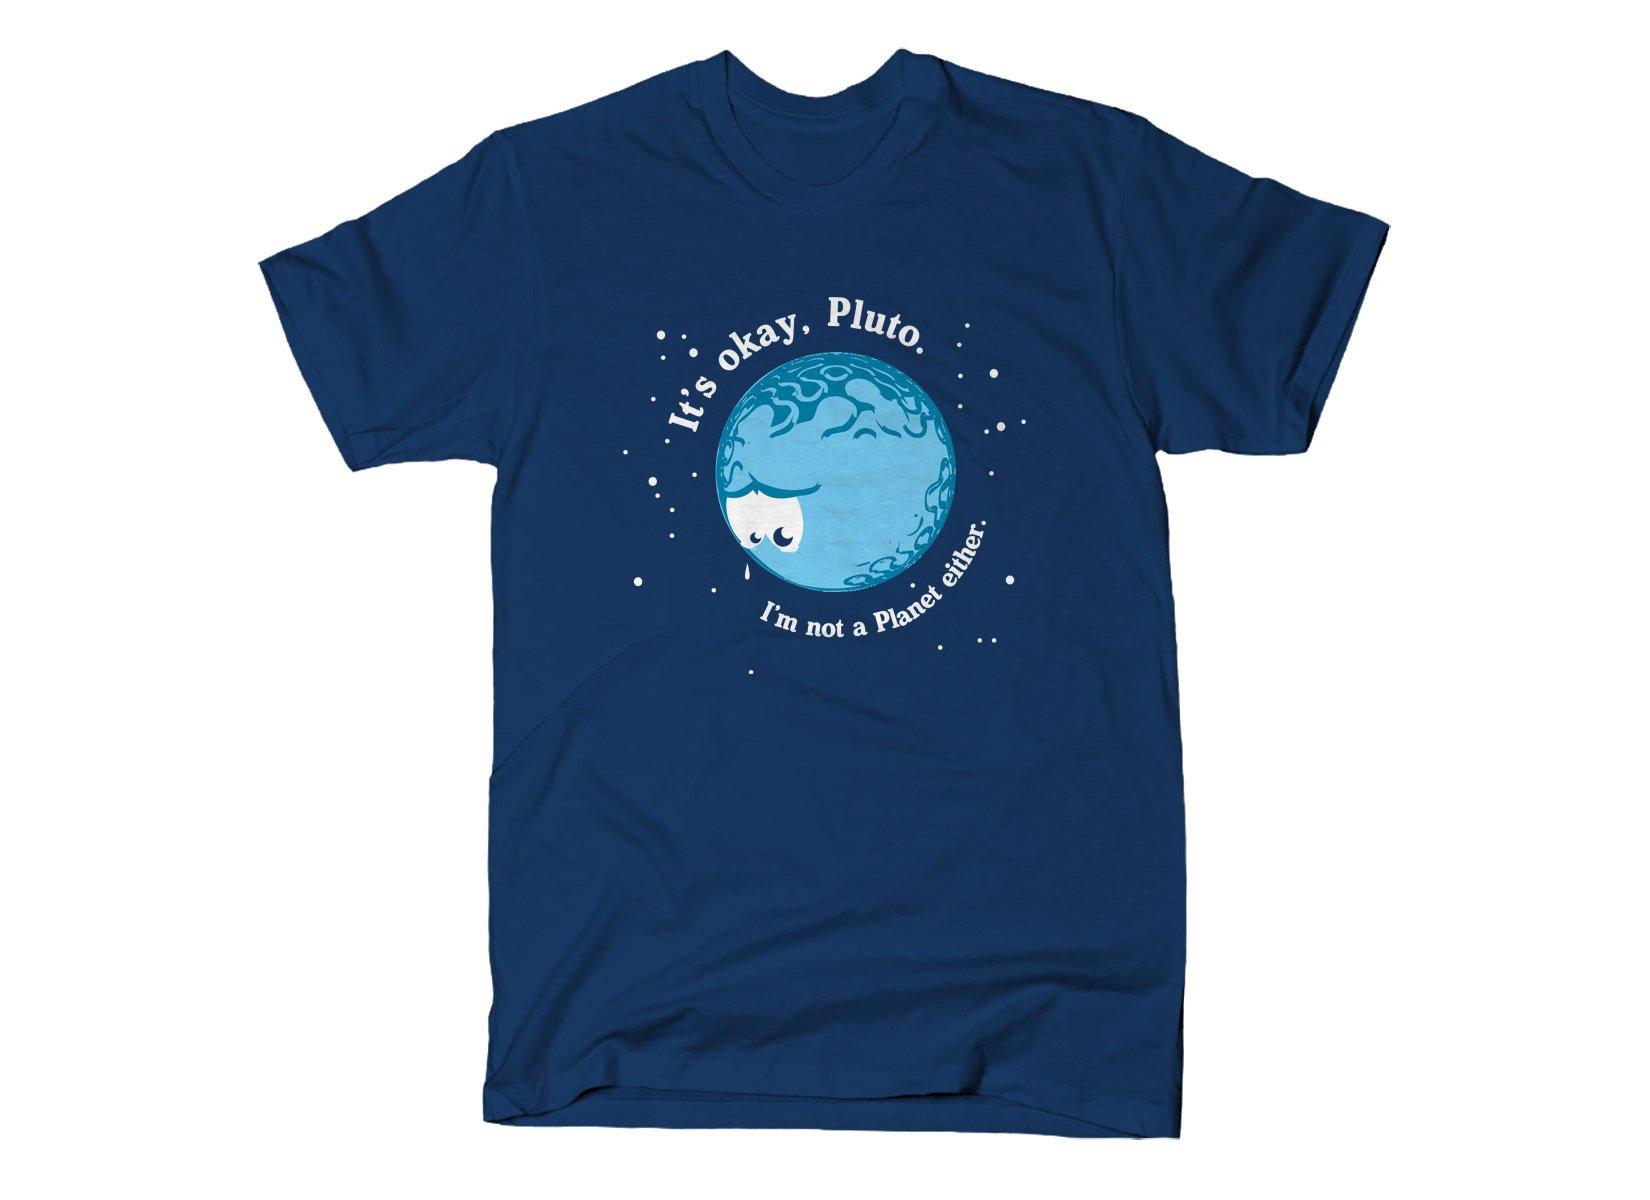 It's Okay Pluto on Mens T-Shirt